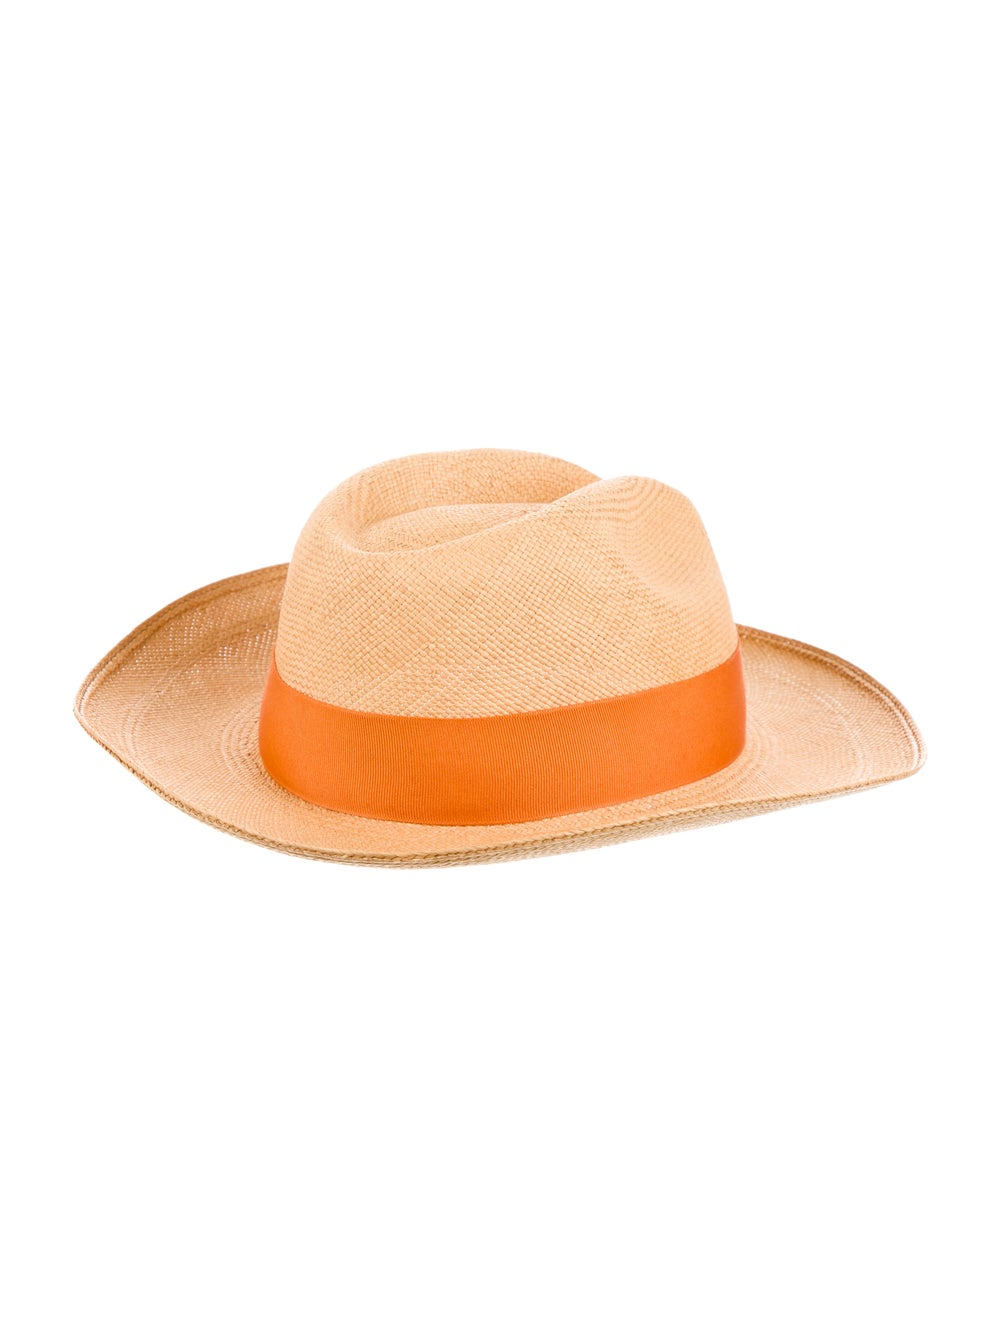 Artesano Straw Wide Brim Hat orange - image 2